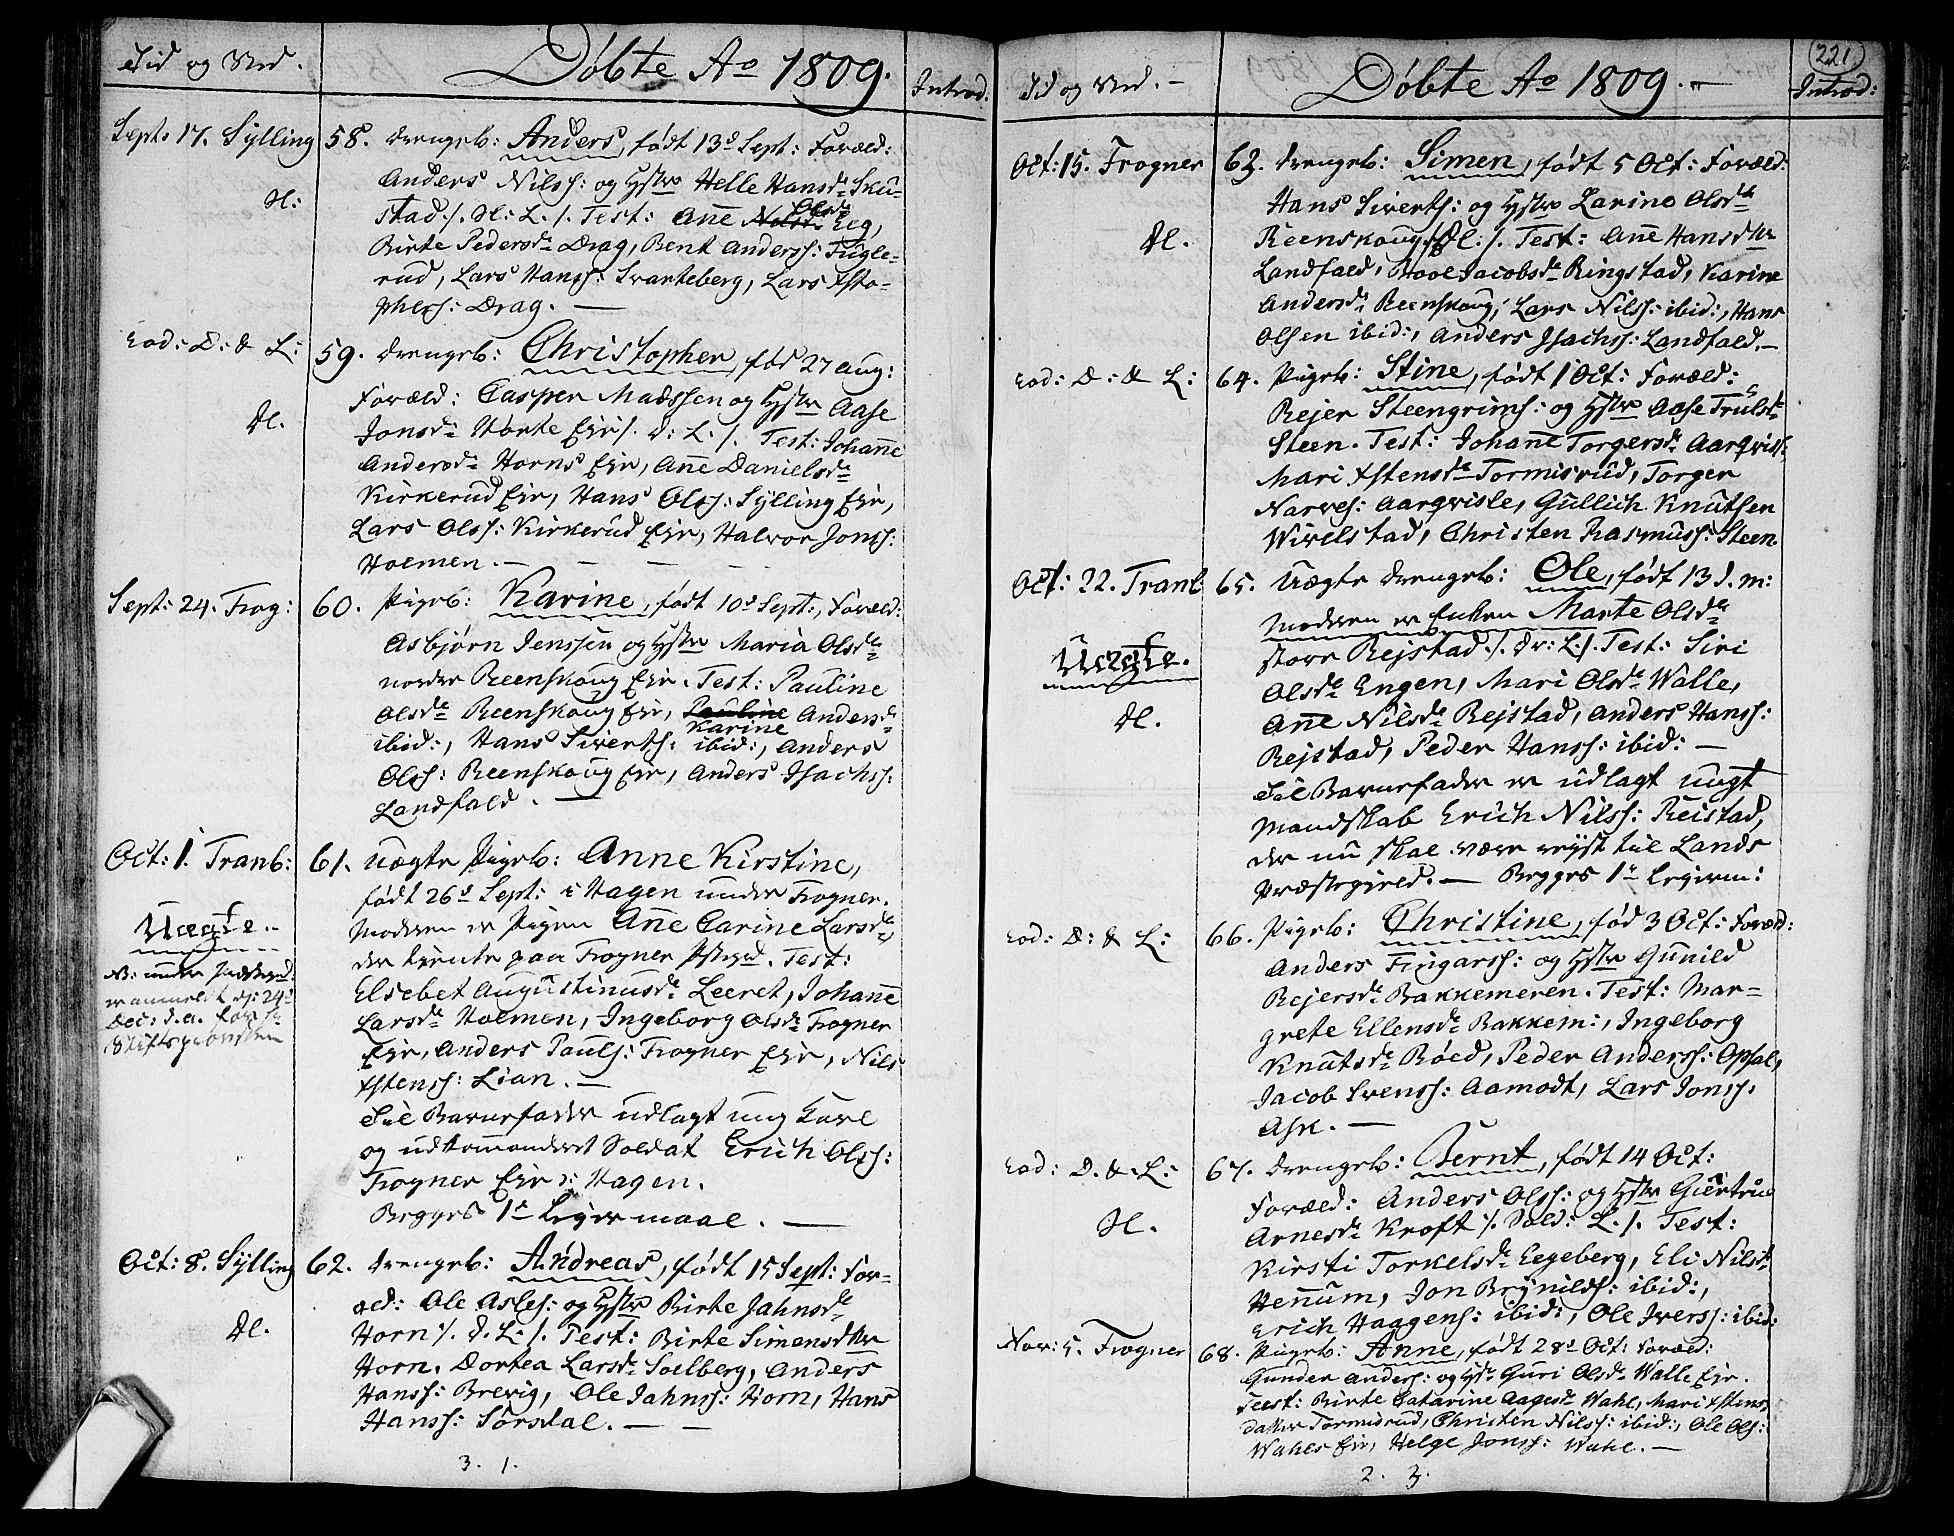 SAKO, Lier kirkebøker, F/Fa/L0007: Ministerialbok nr. I 7, 1794-1813, s. 221